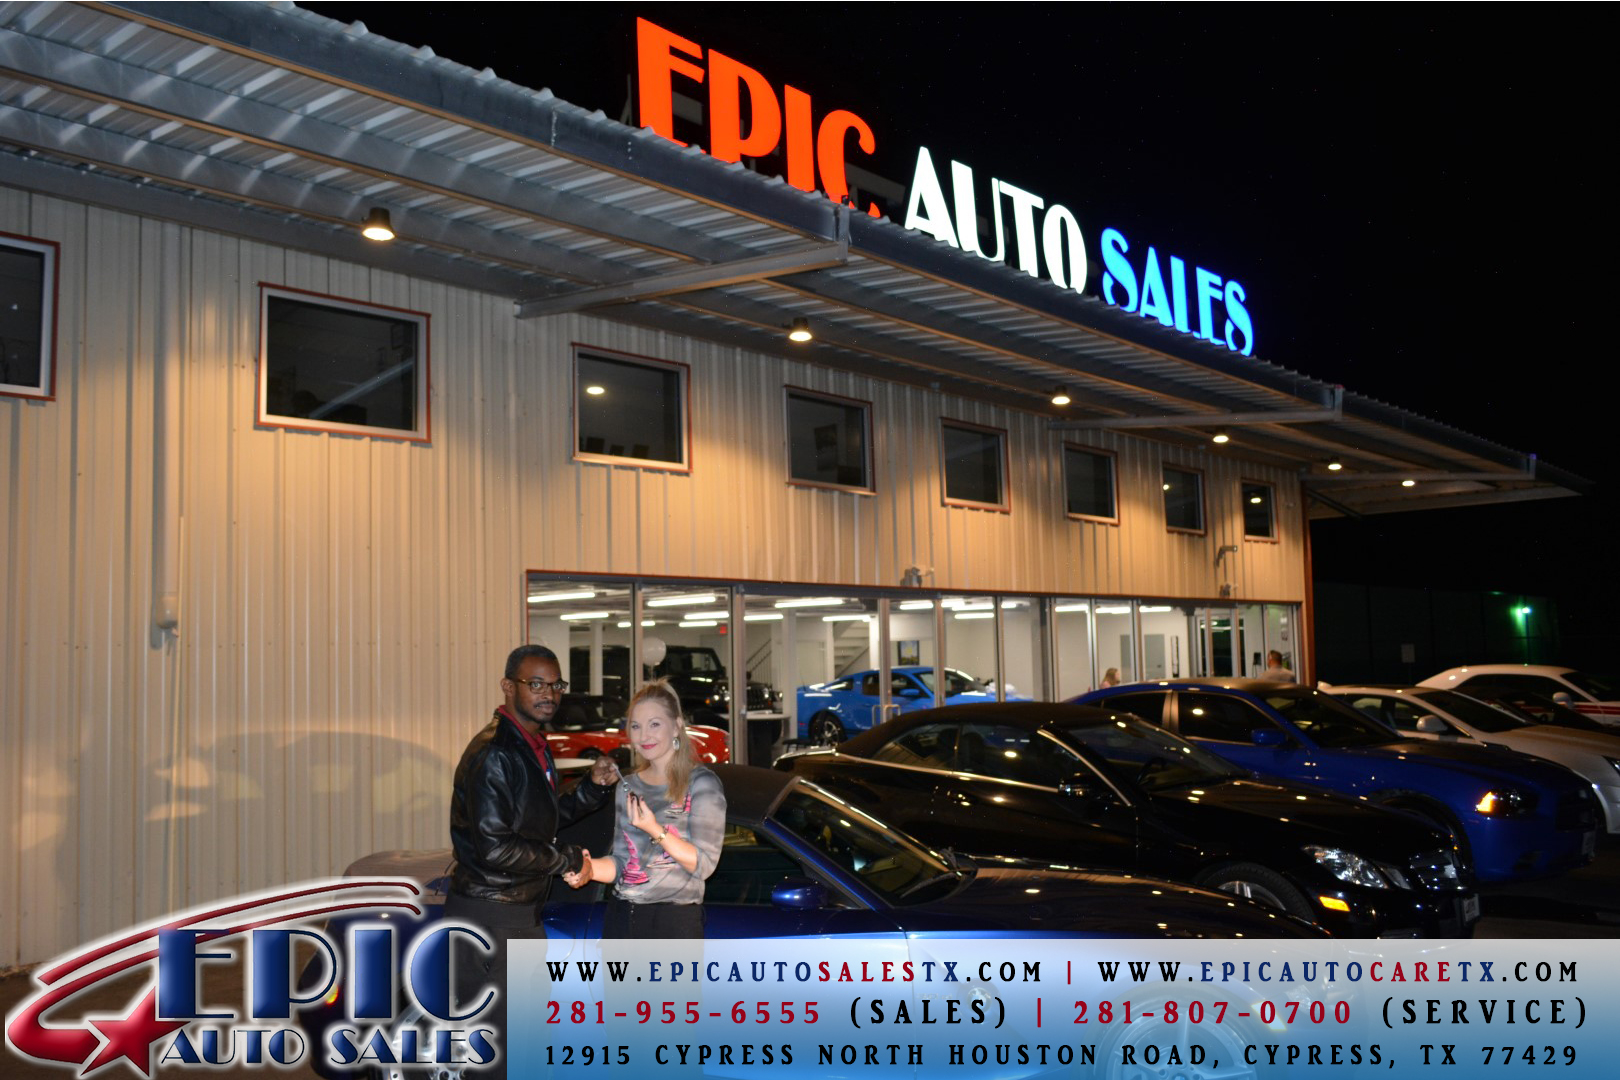 Epic Auto Sales image 3